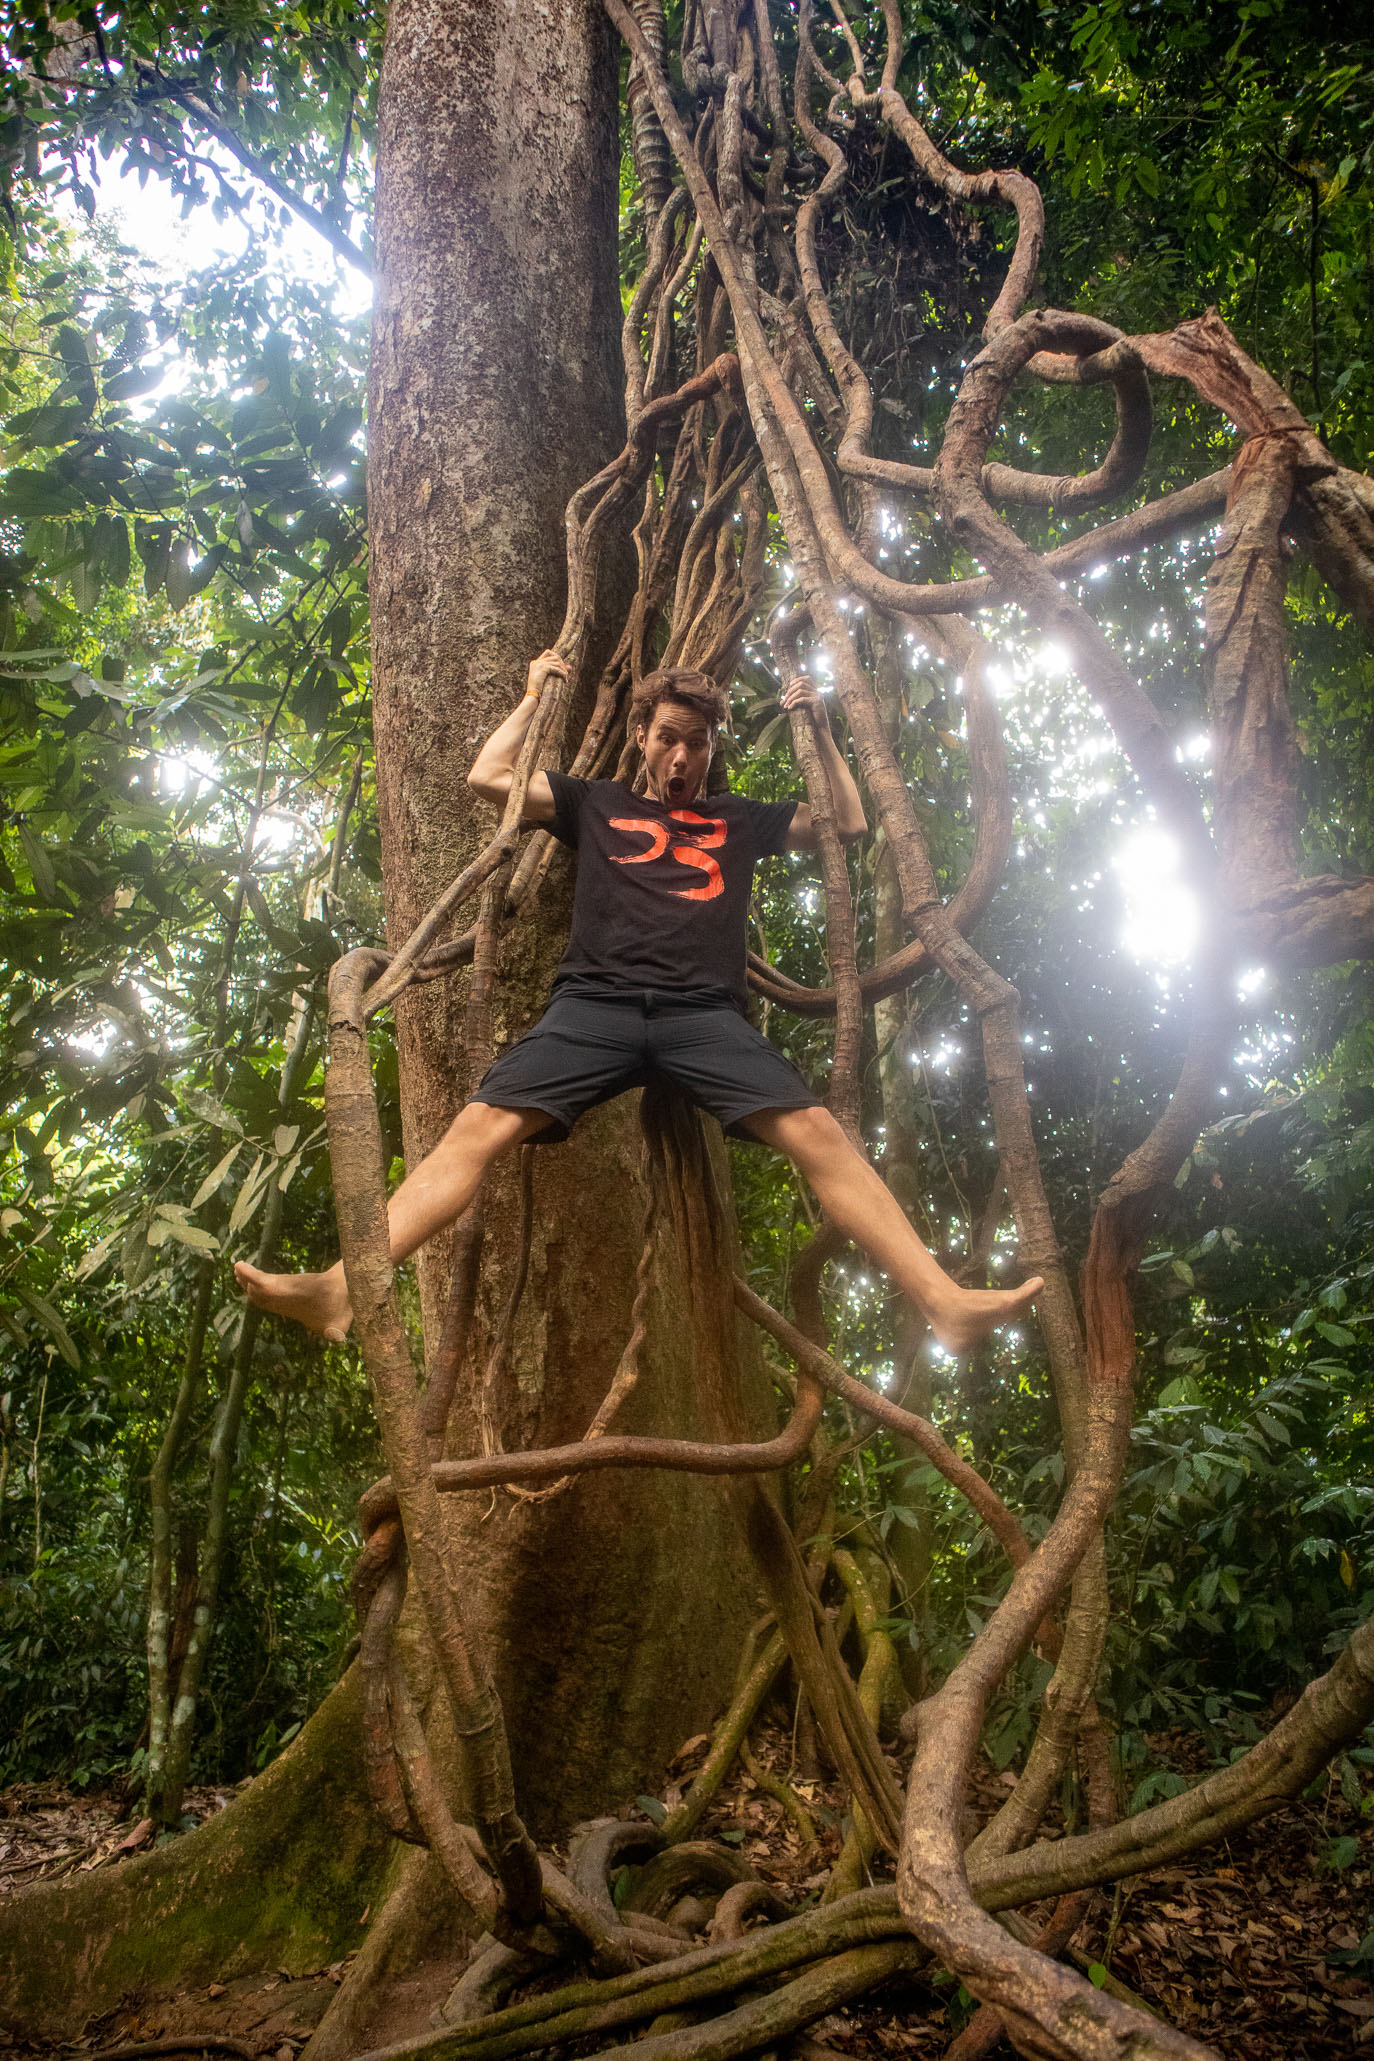 https://bubo.sk/uploads/galleries/7542/tomashornak_indonezia_sumatra_img_0120-1-8.jpg